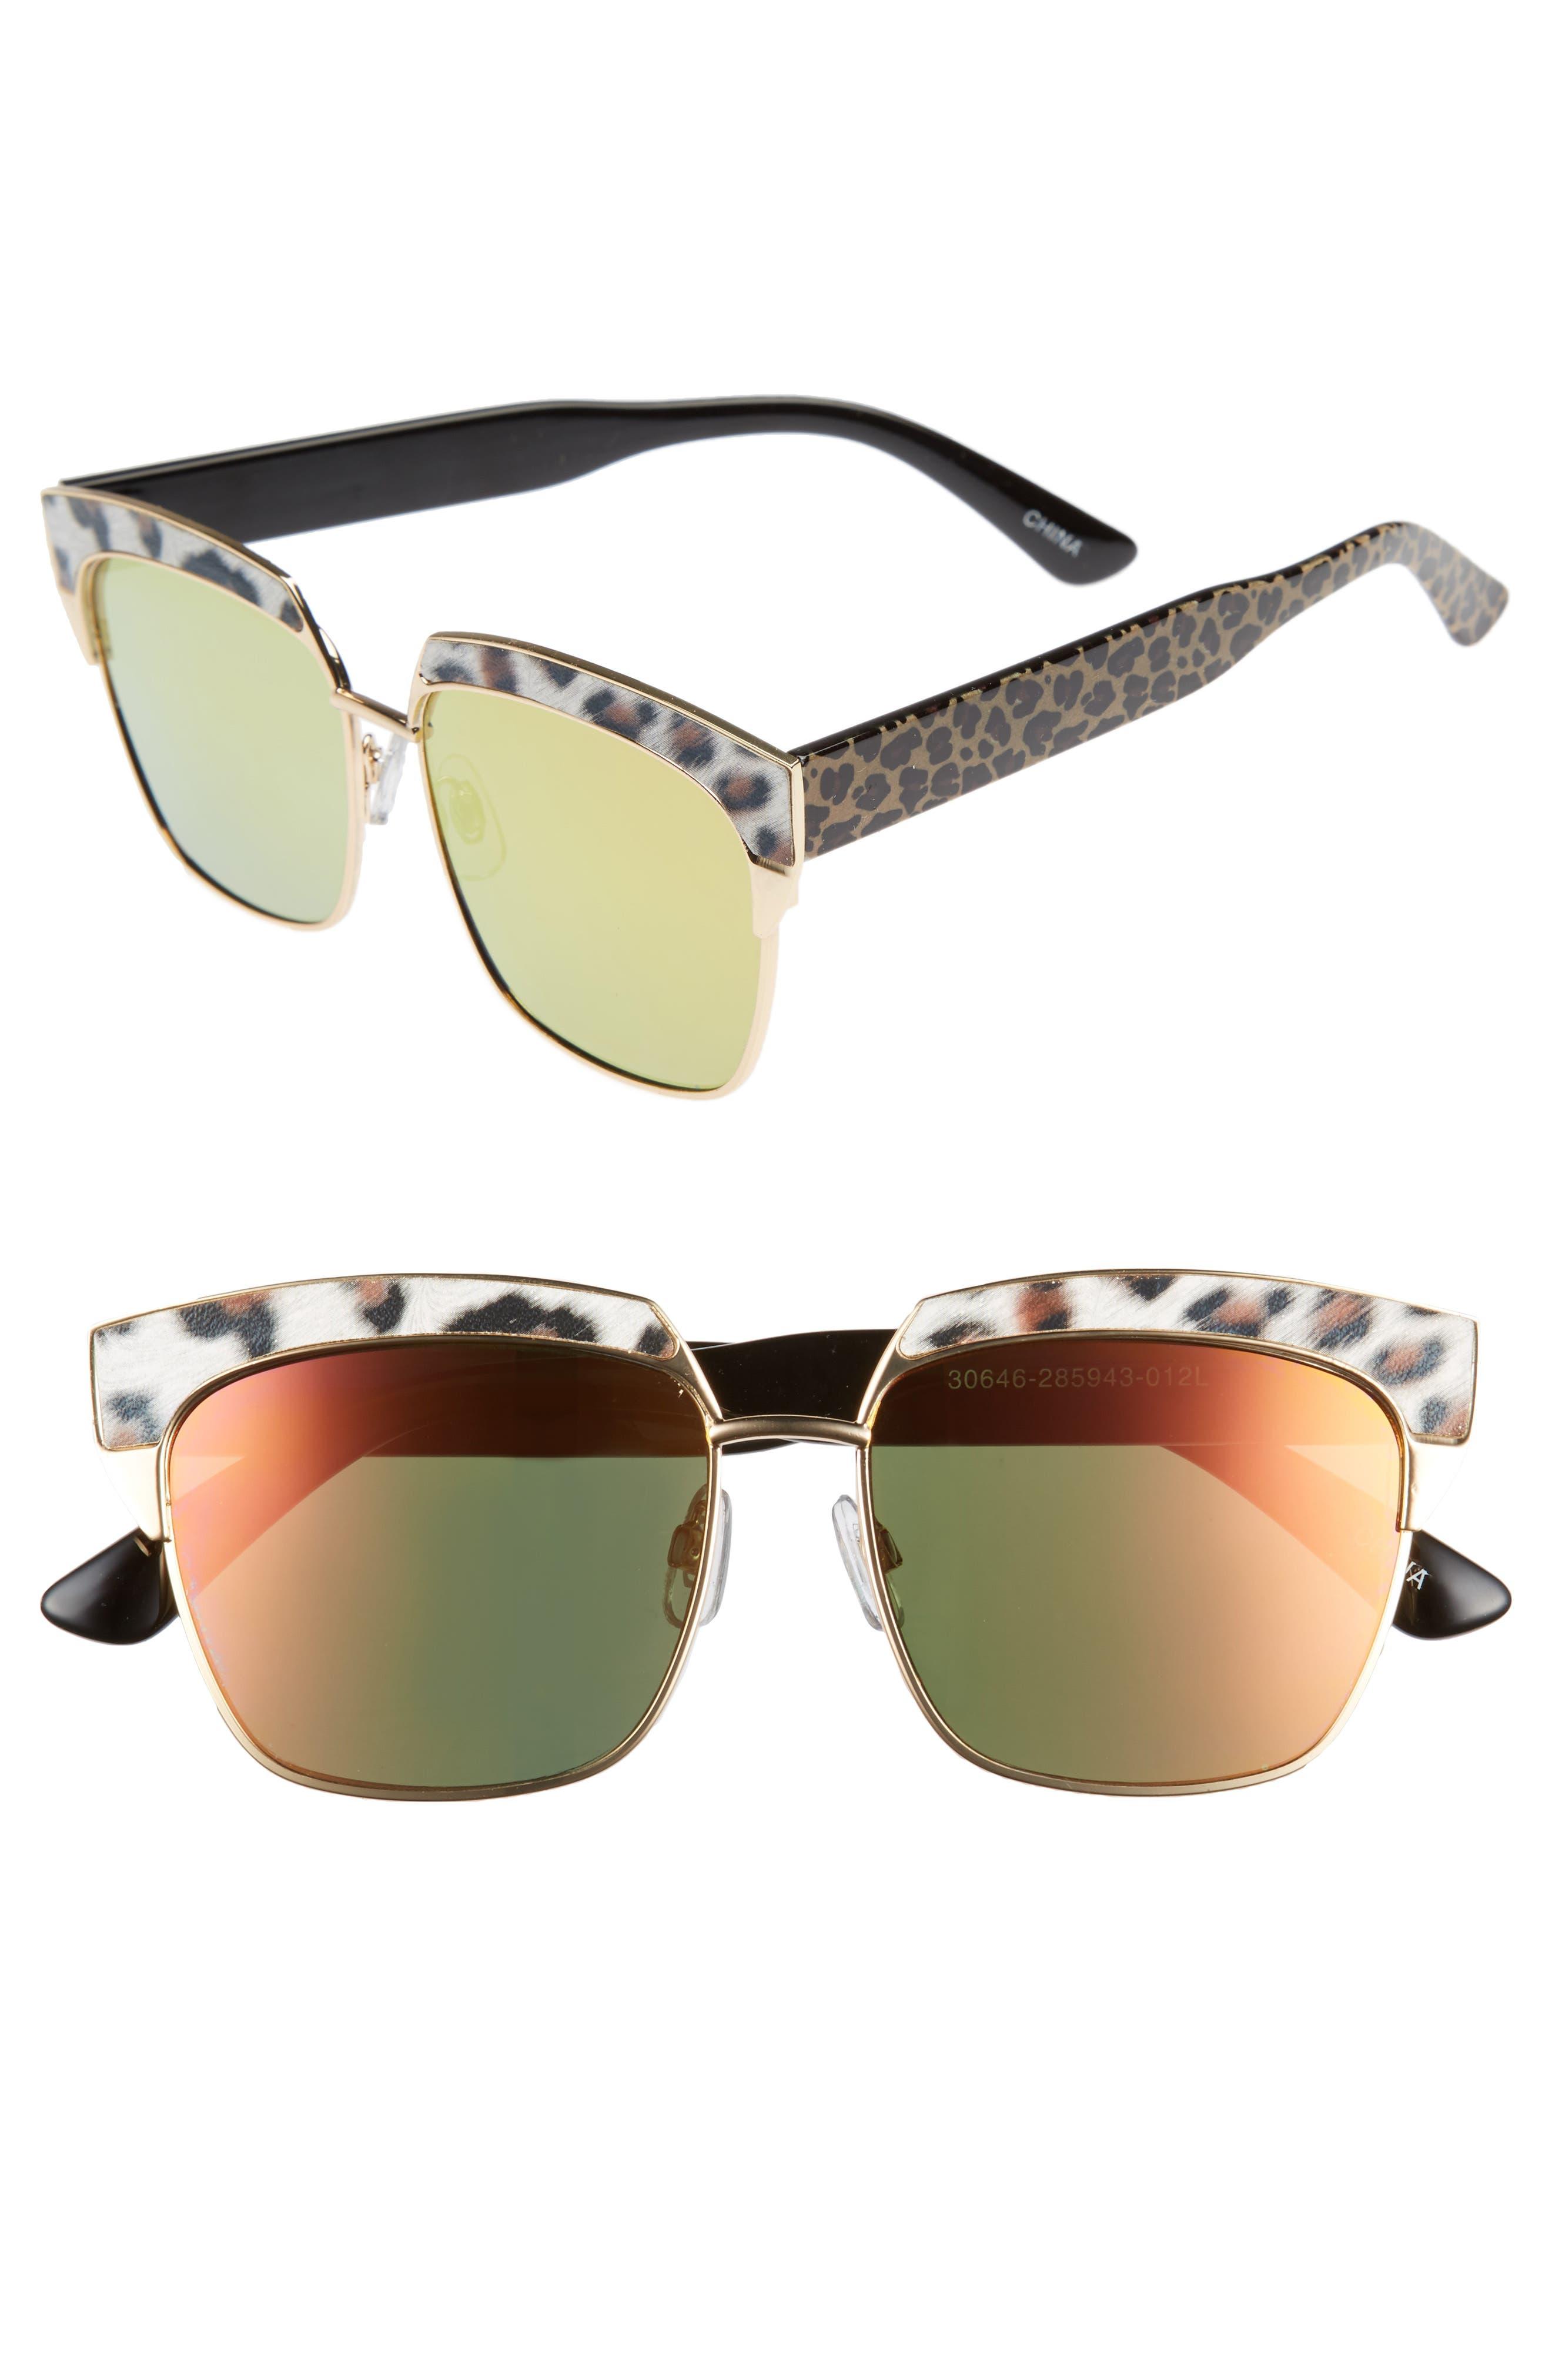 Leopard Print Top Bar Sunglasses,                             Main thumbnail 1, color,                             Multi/ Gold